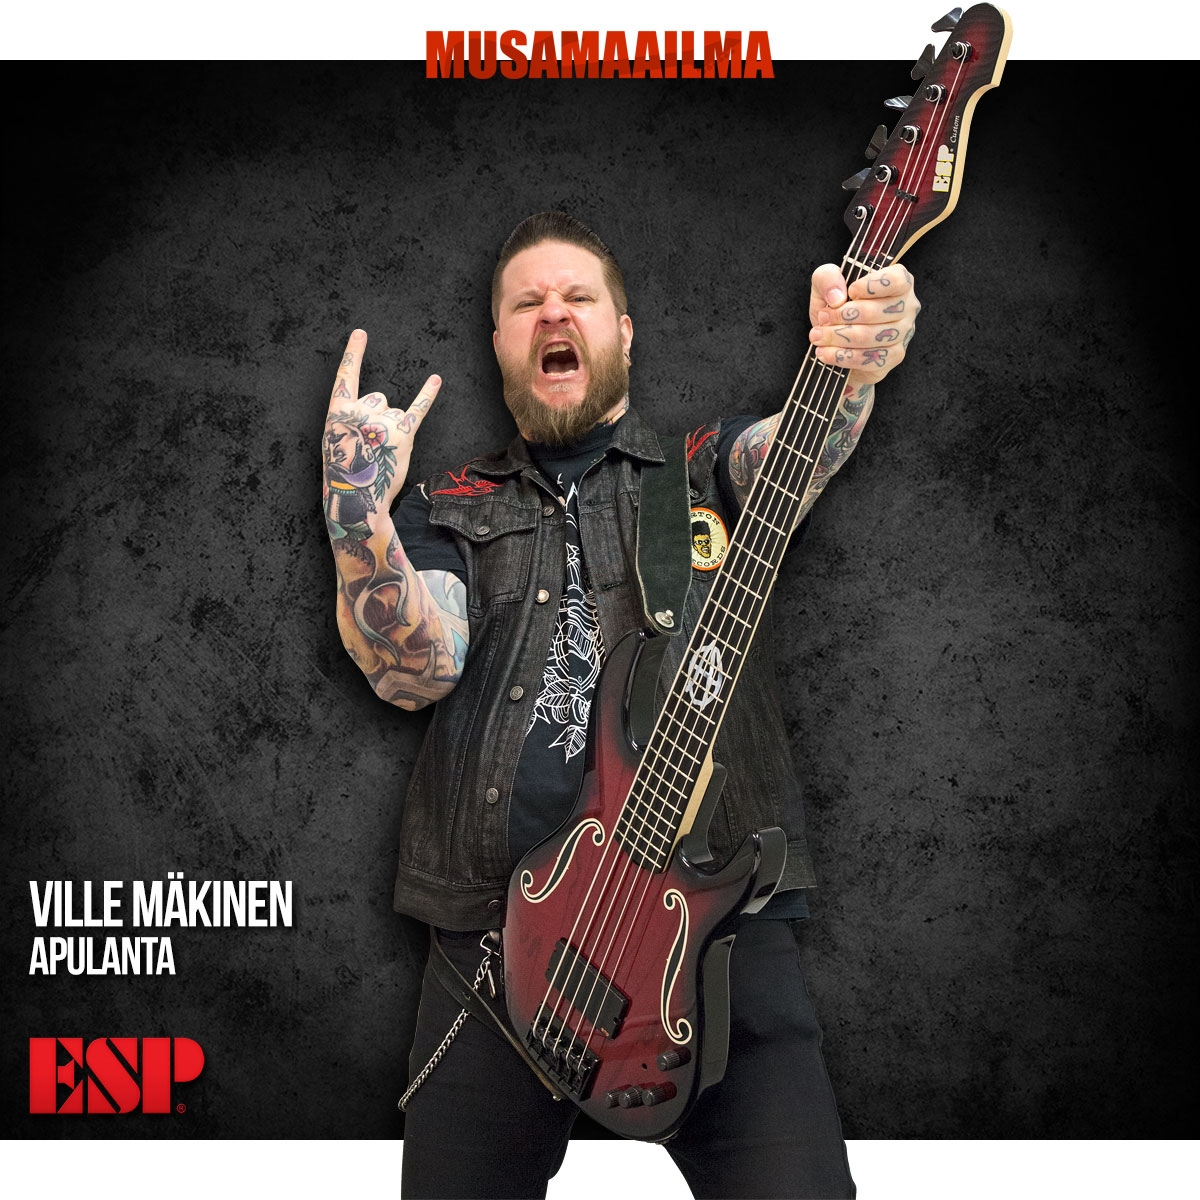 Ville Mäkinen, Apulanta - ESP Custom Shop